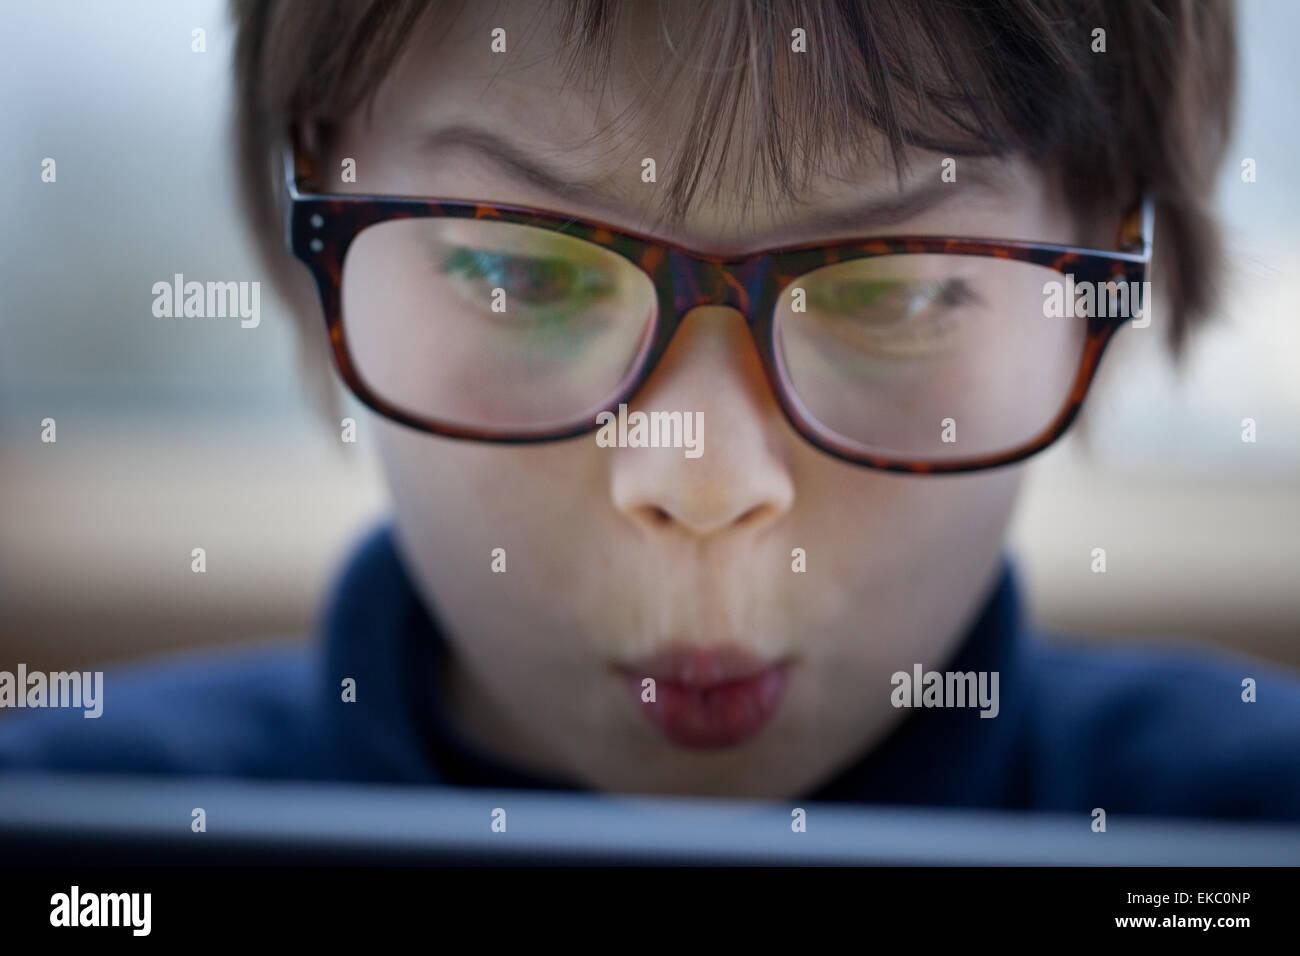 Cerca de boy tirando a cara mediante tableta digital Imagen De Stock